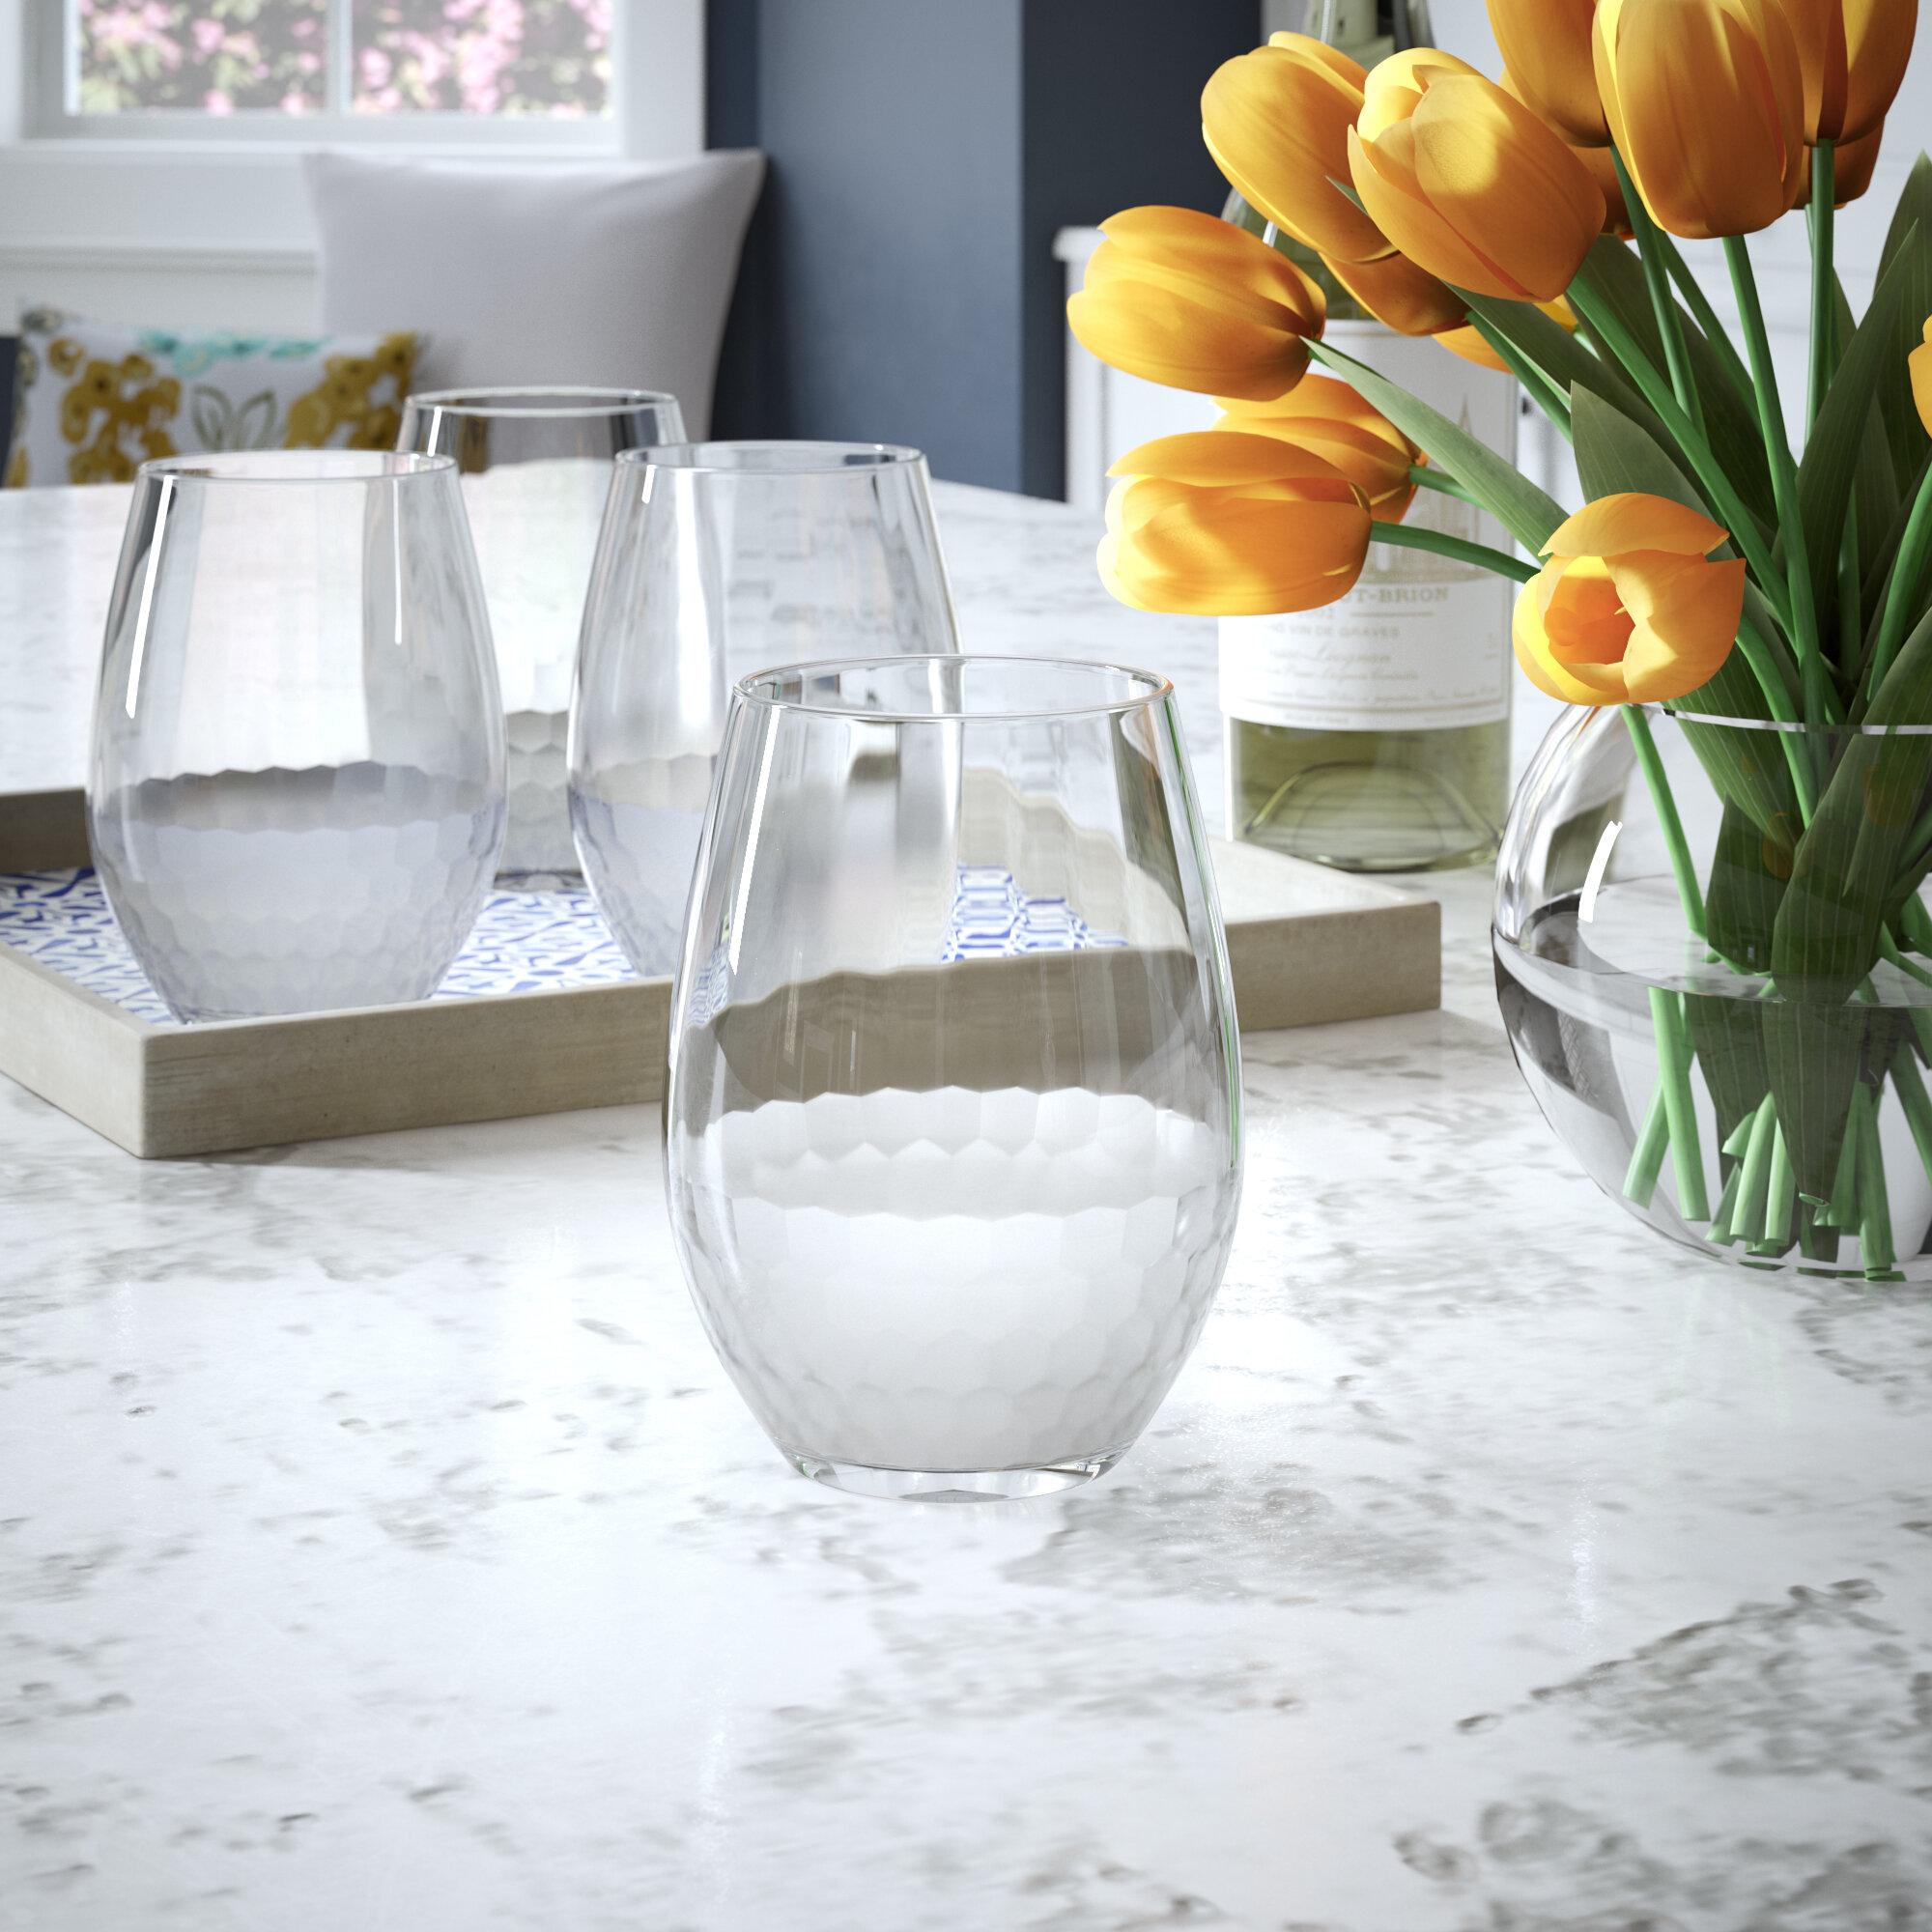 Mercer41 Lopez 17 Oz Stemless Wine Glass Reviews Wayfair